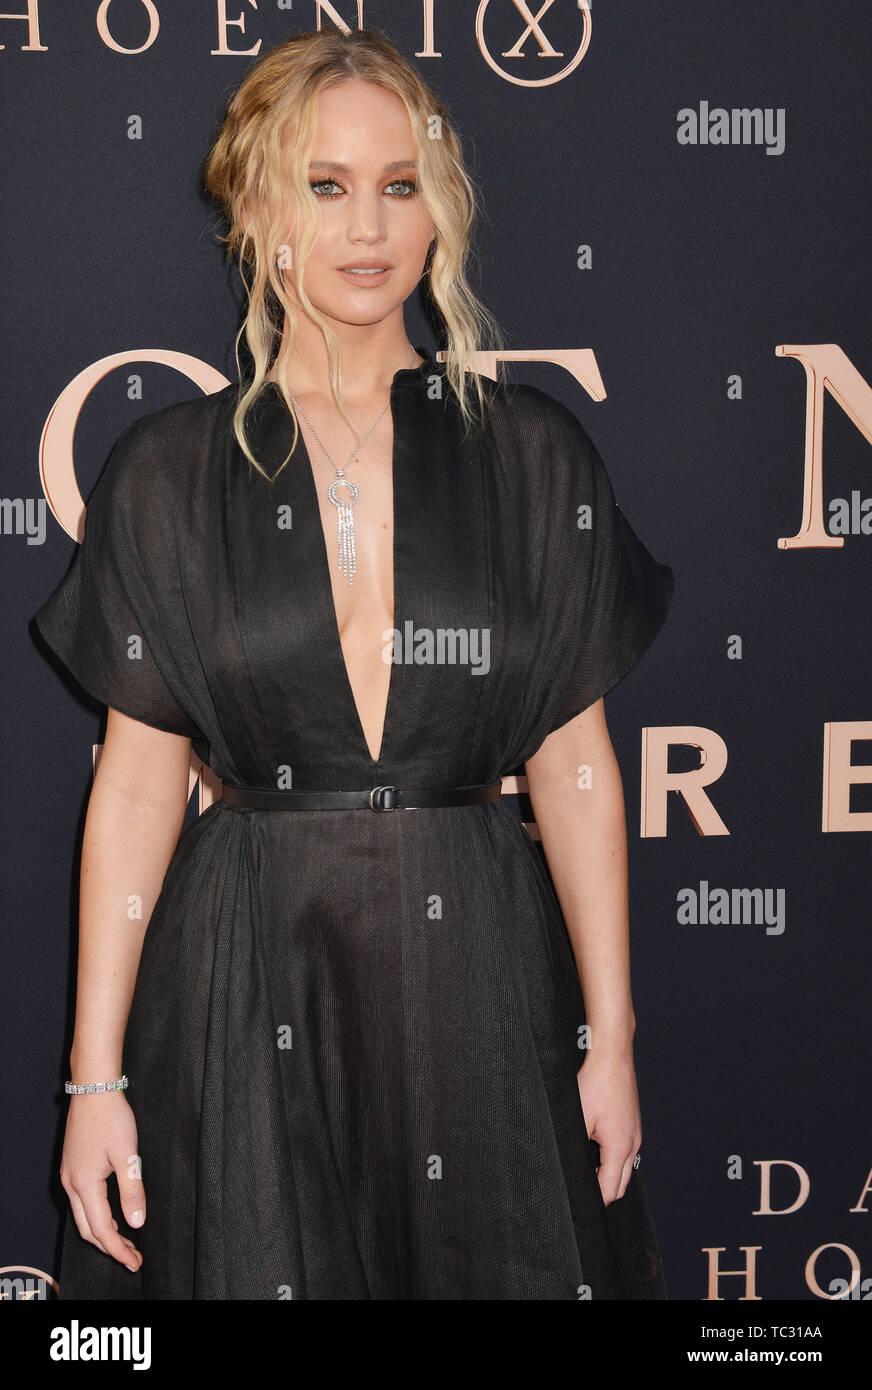 Los Angeles, USA  04th June, 2019  Jennifer Lawrence 090